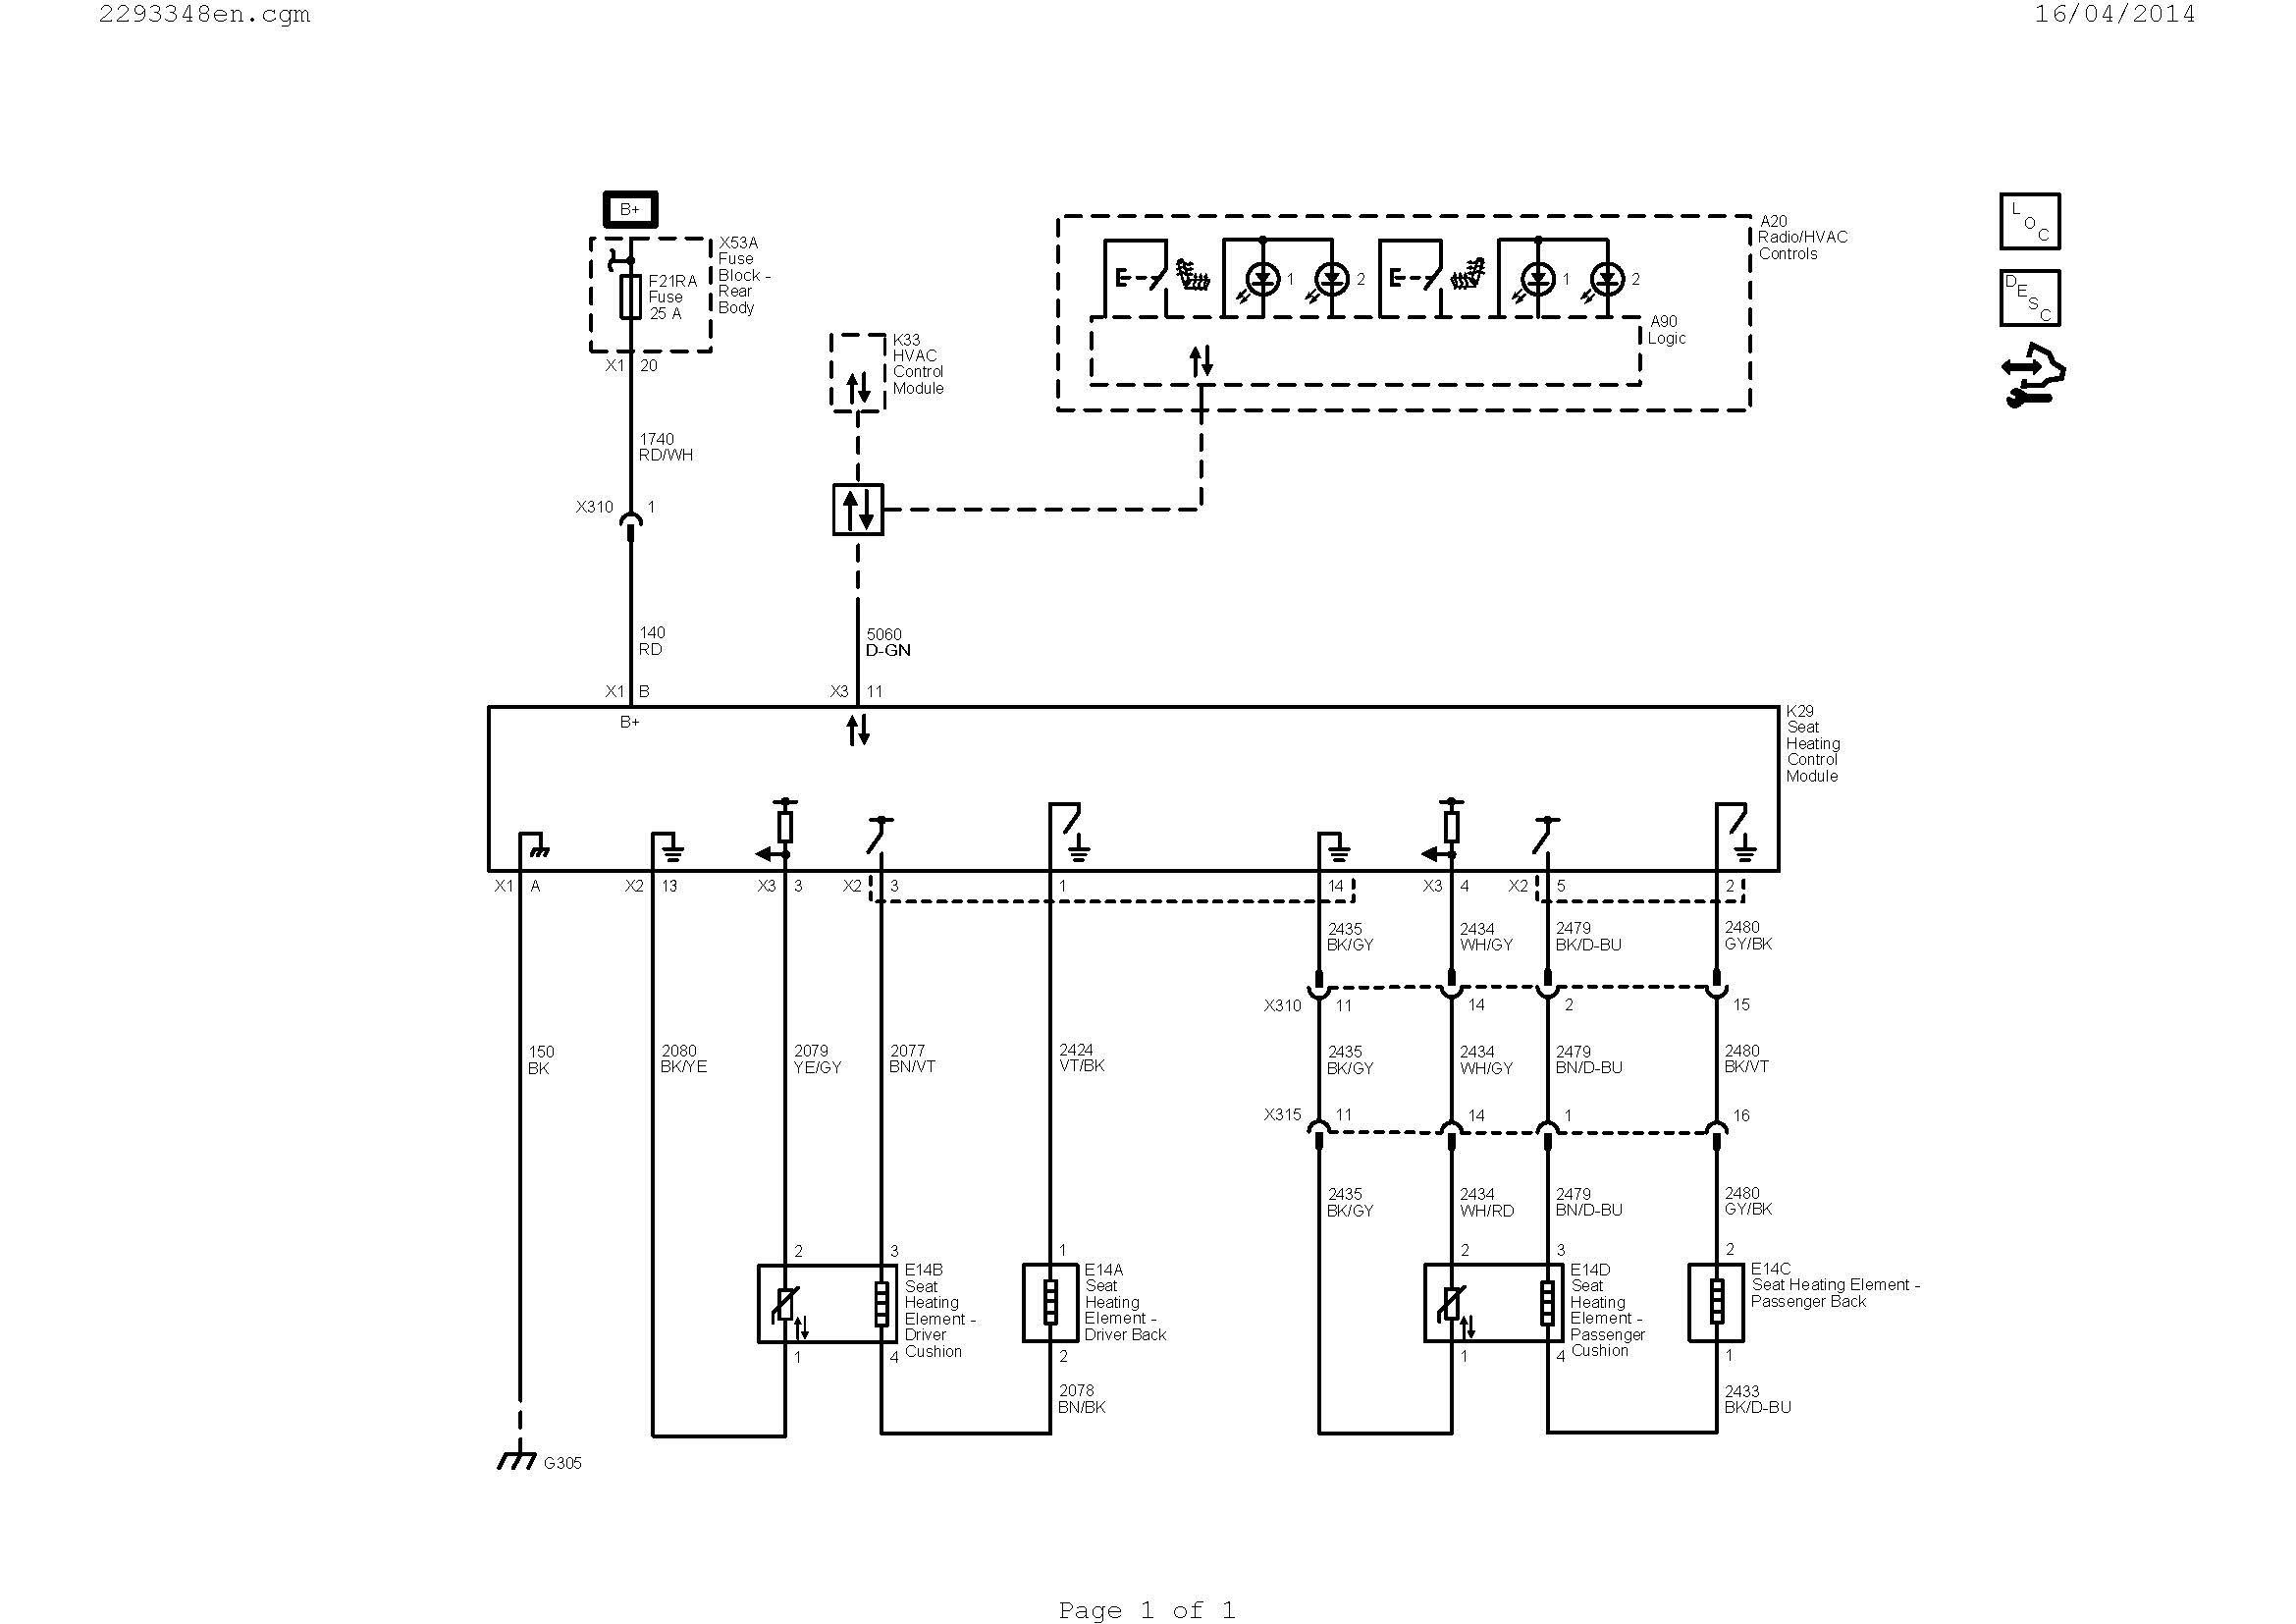 hvac wiring diagram software Collection-Hvac Wiring Diagram software Wiring Diagrams for Electrical New Wiring Diagram Guitar Fresh Hvac Diagram 15-g